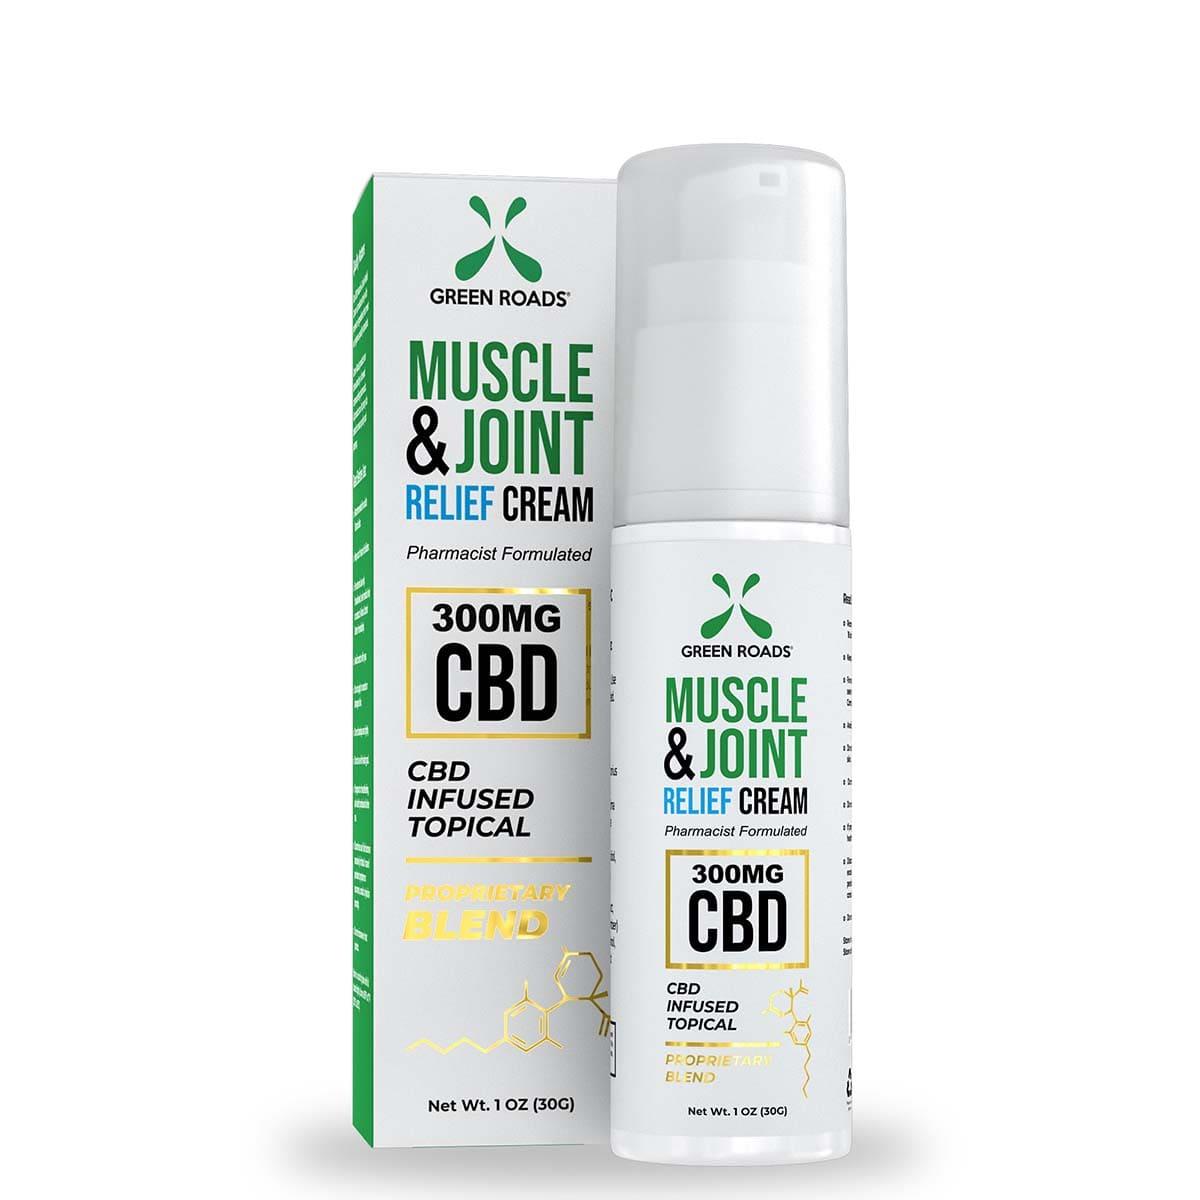 Green Roads Soothing CBD Topical Cream - 300mg CBD - 1oz